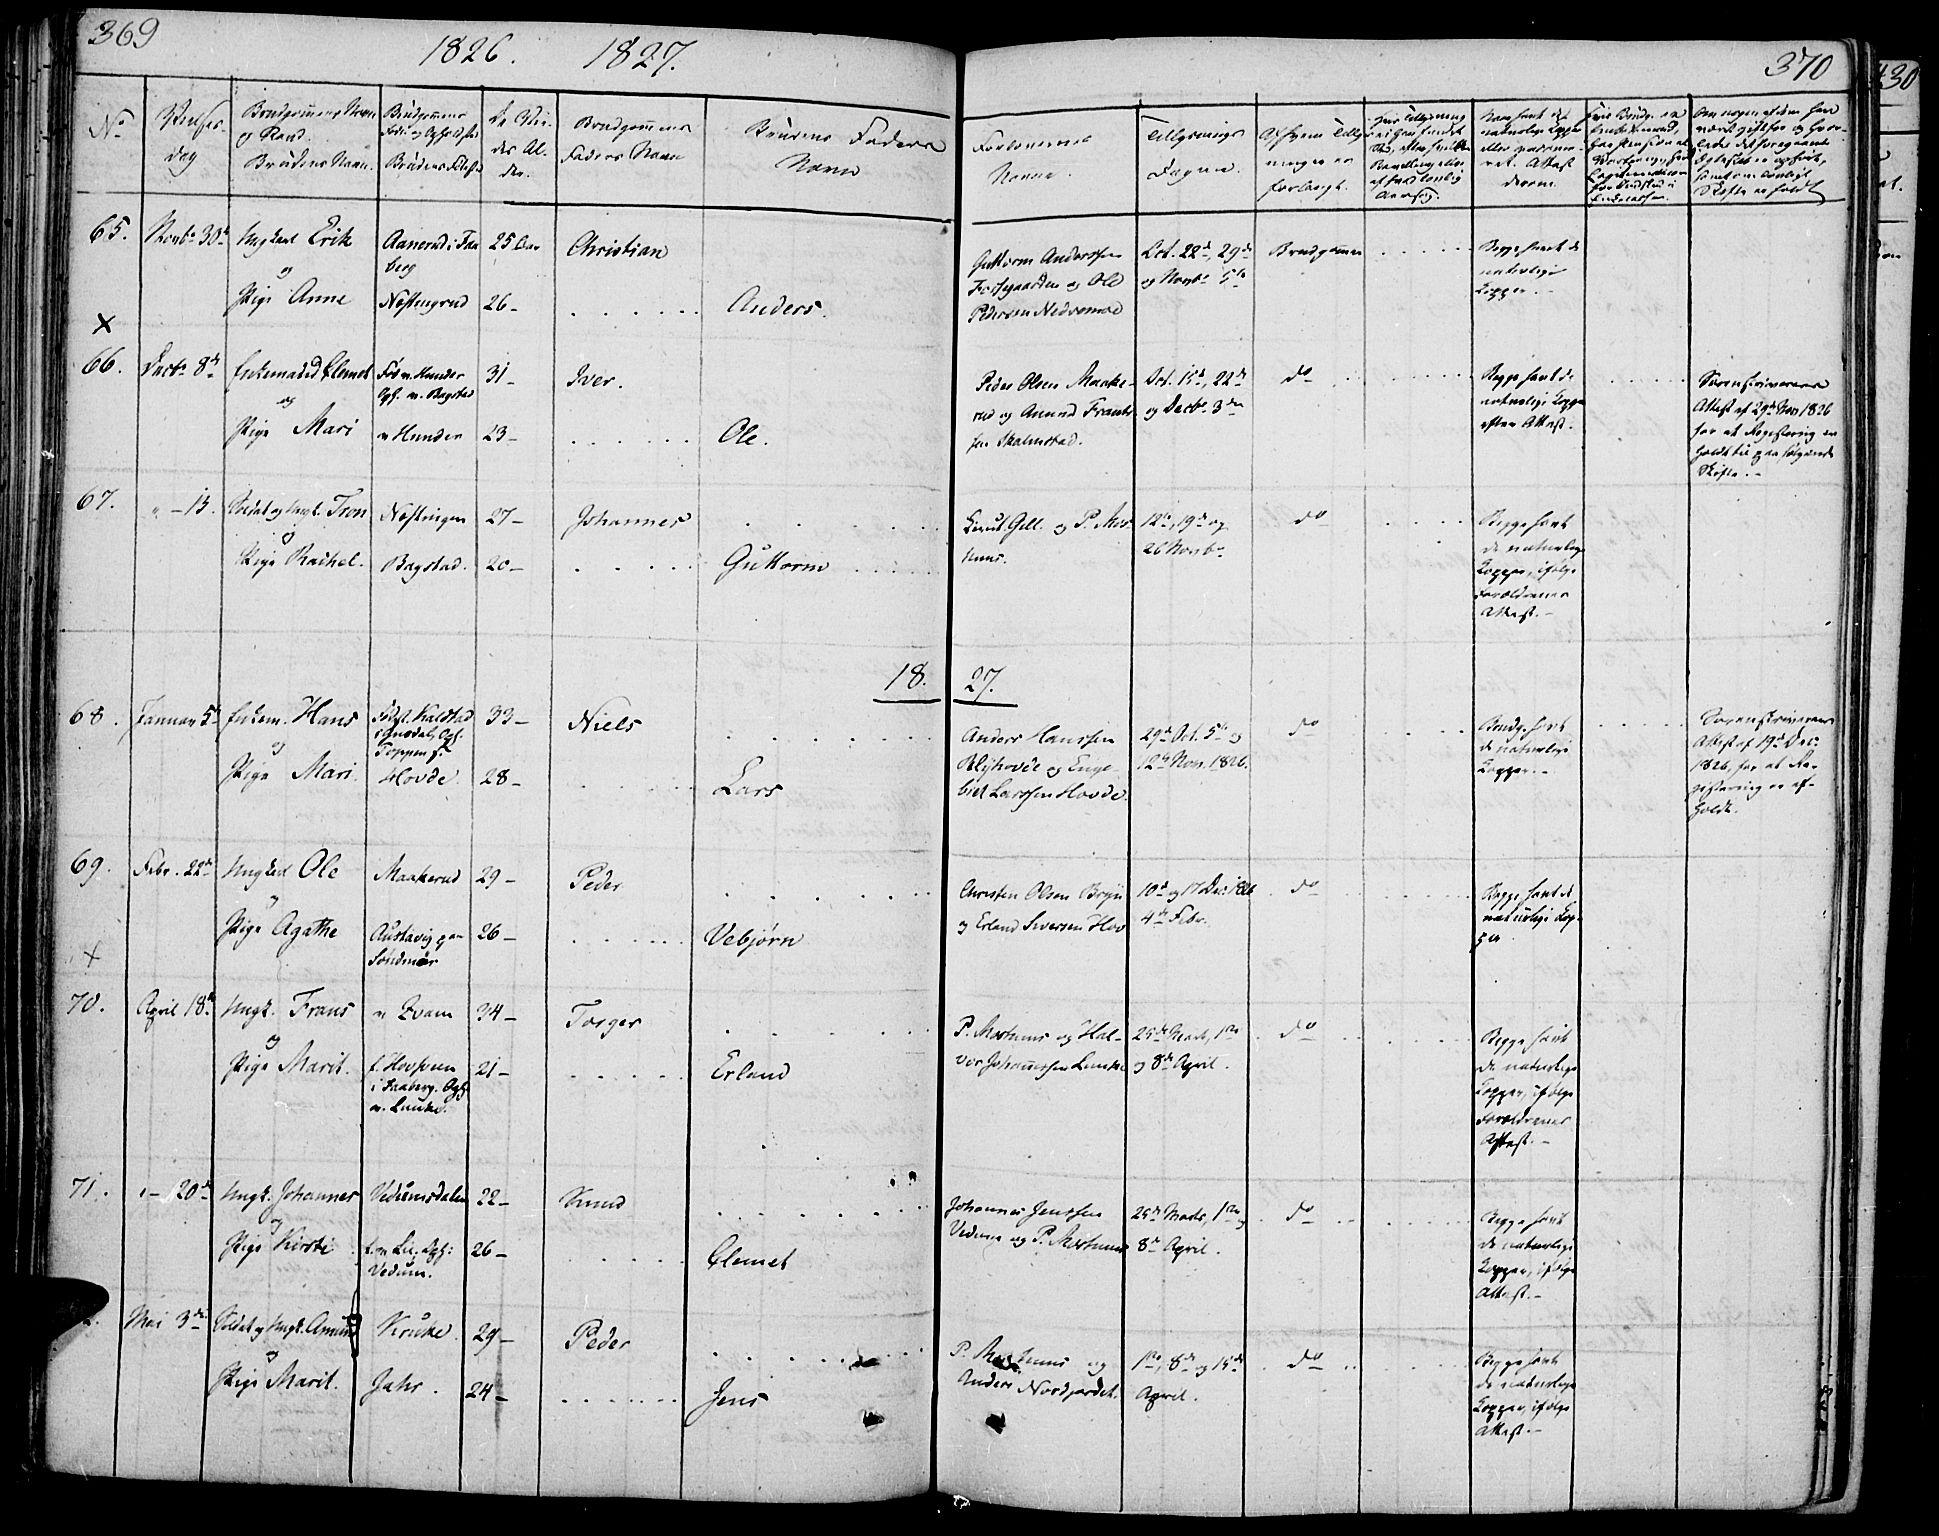 SAH, Øyer prestekontor, Ministerialbok nr. 4, 1824-1841, s. 369-370